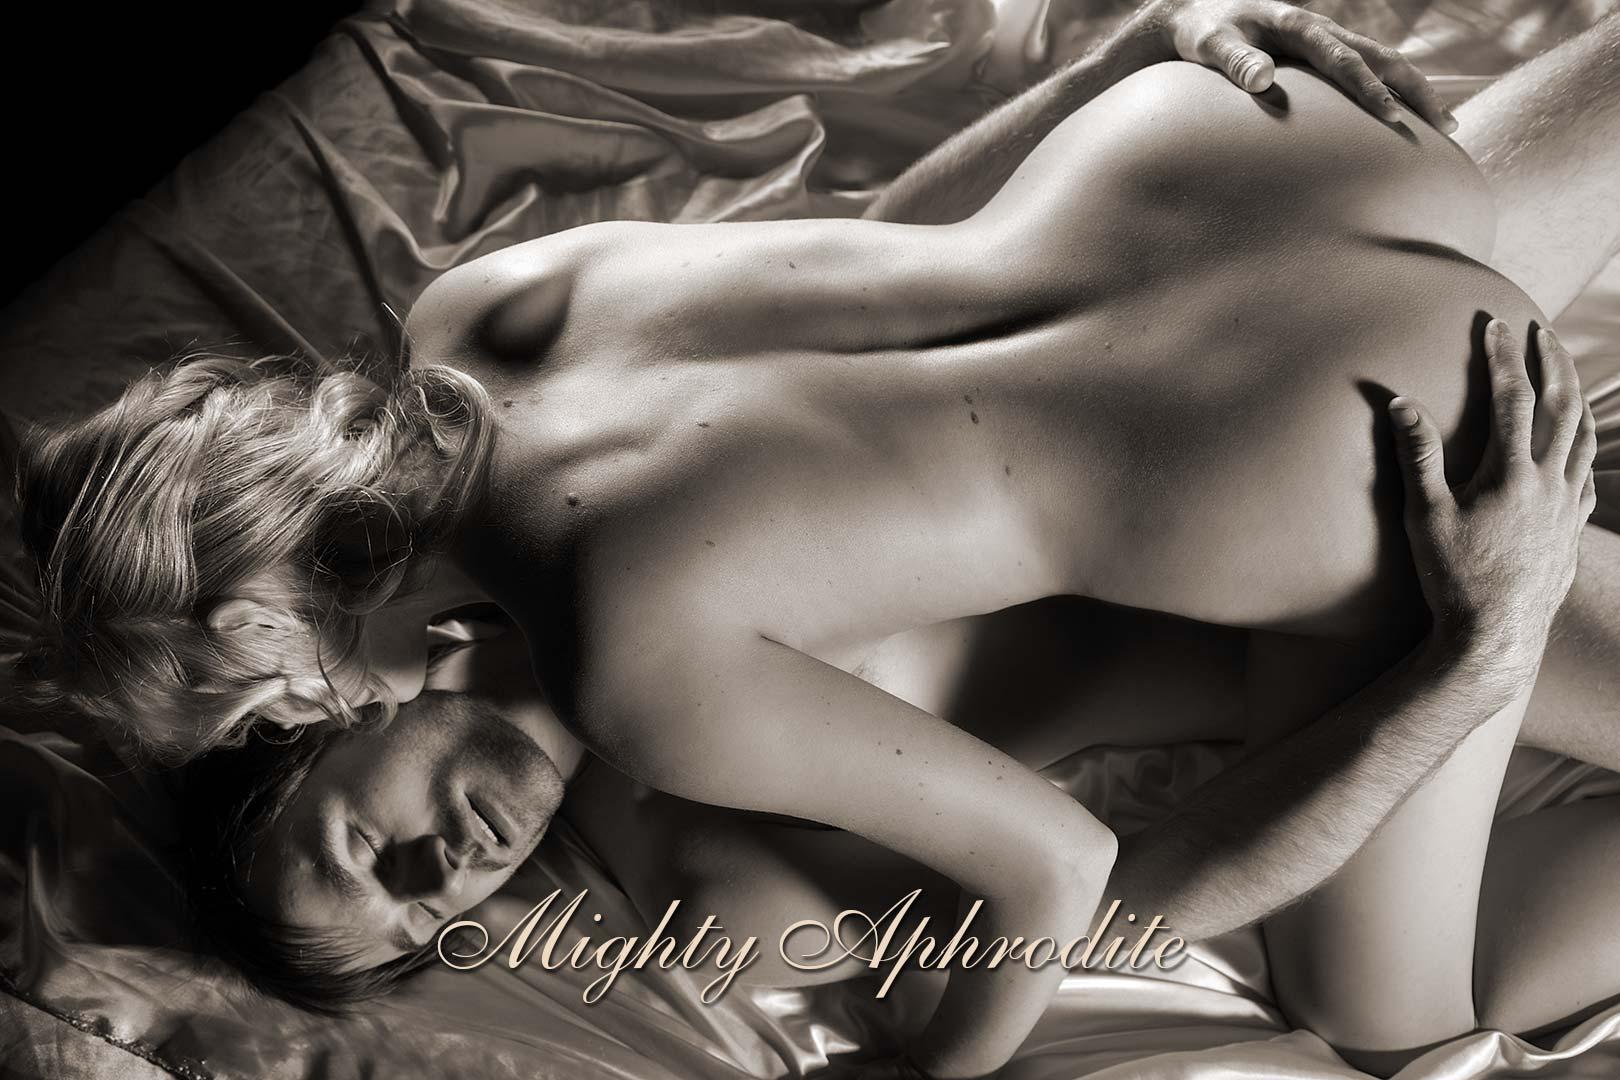 Erotic Photography Porn - Fellatio Erotic Wife Sex Boudoir Photography   Niche Top Mature